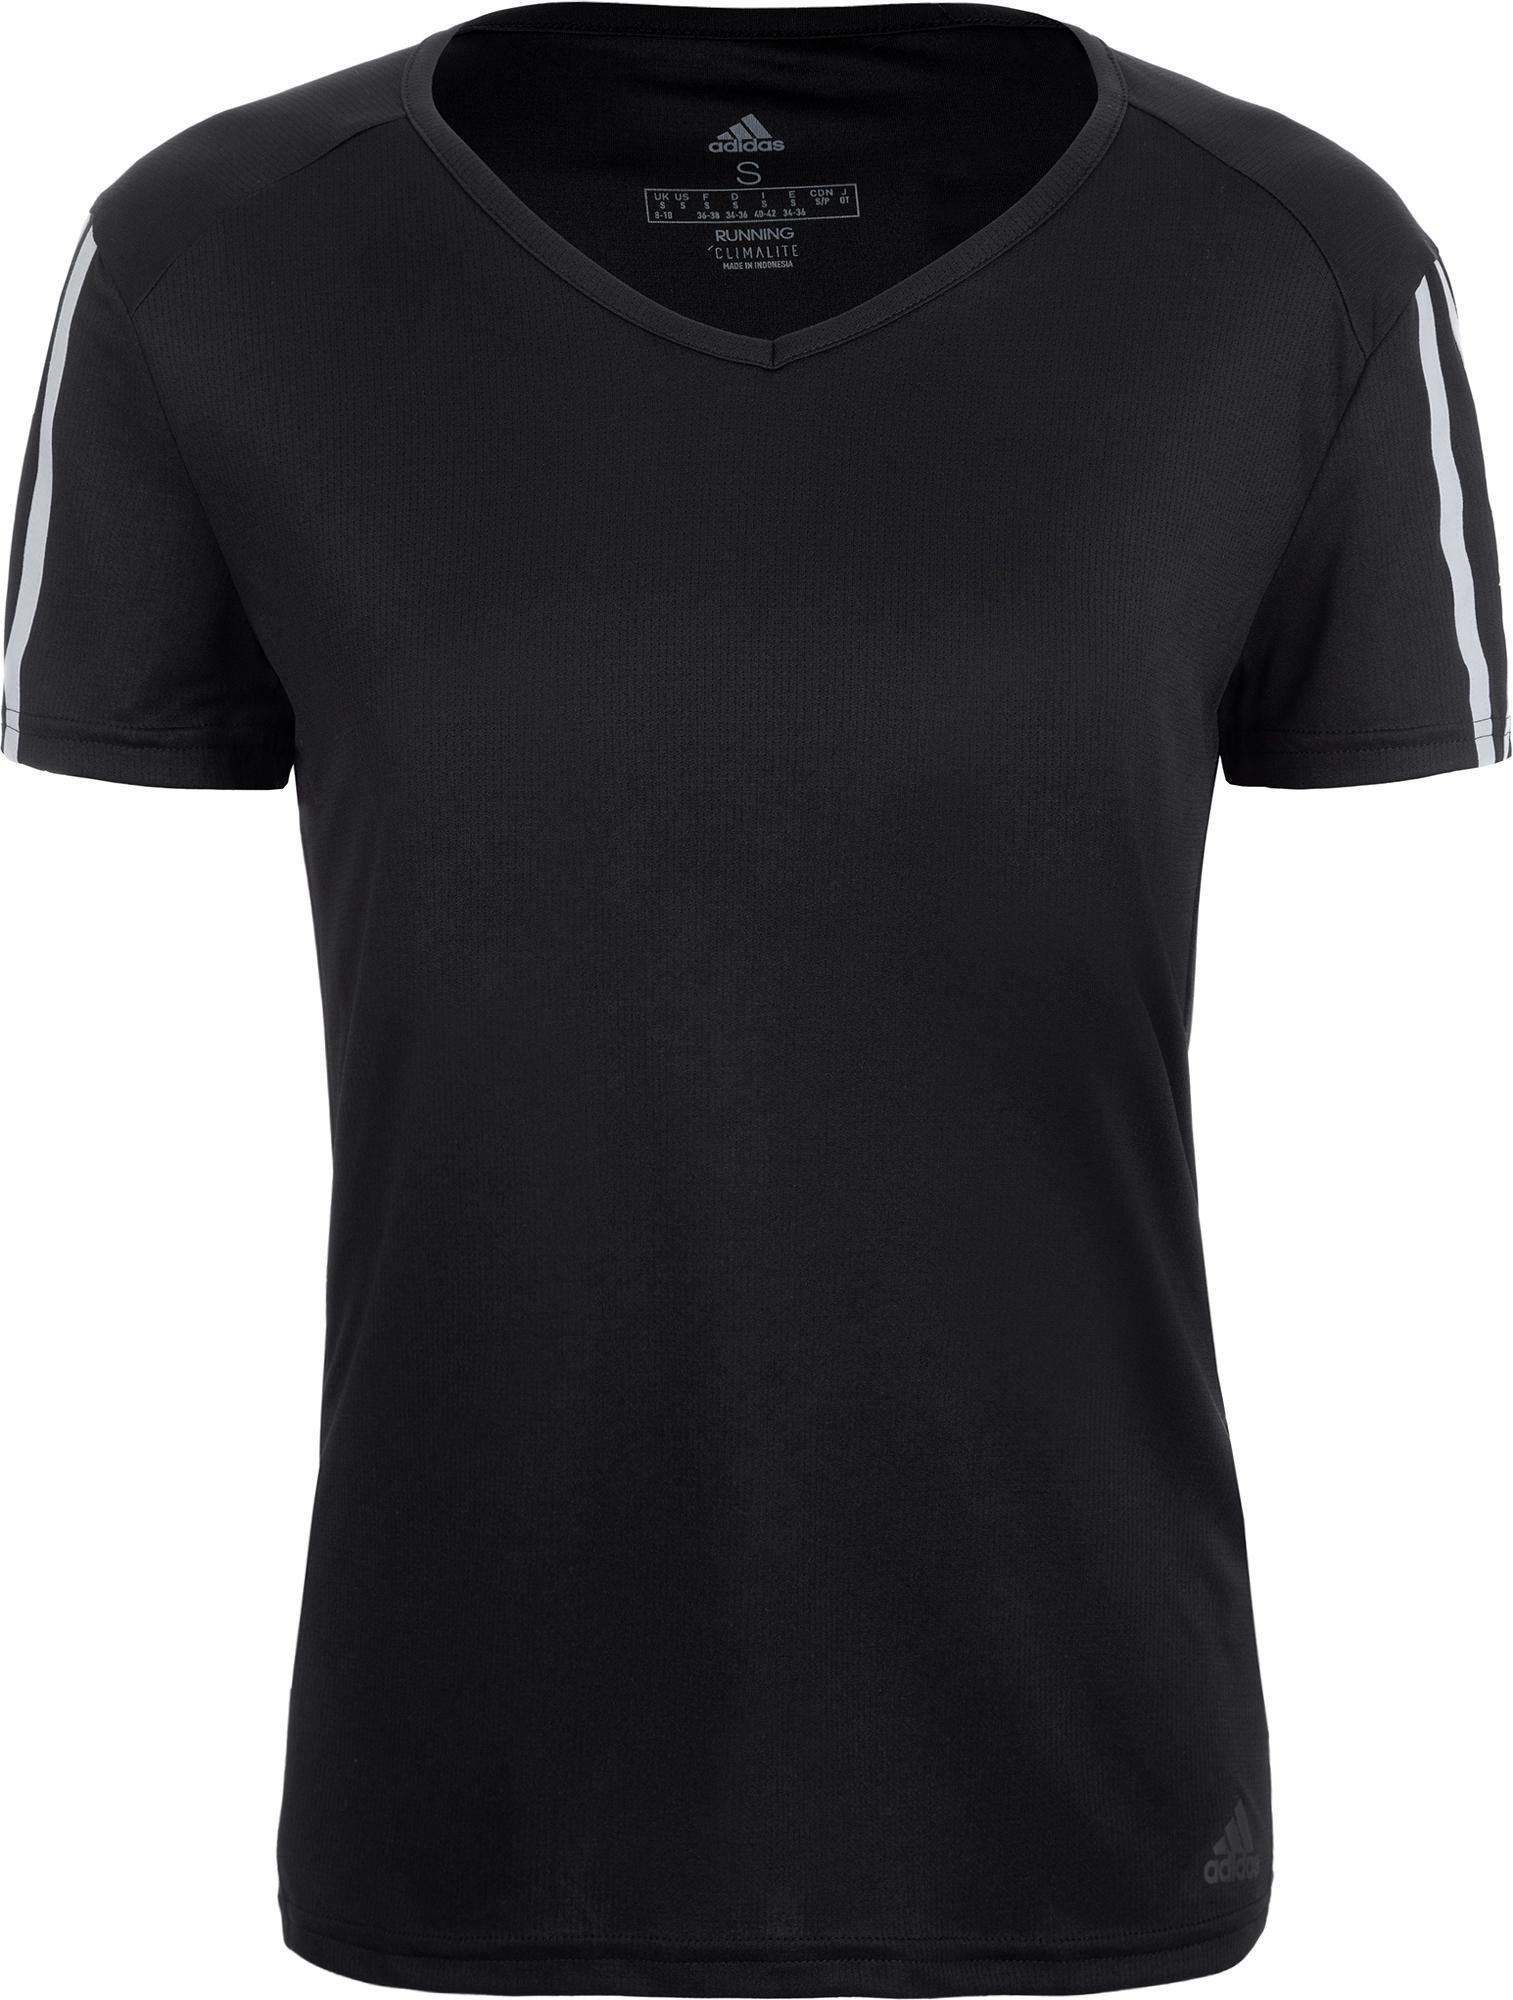 Adidas Футболка женская Adidas Run 3S, размер L все цены